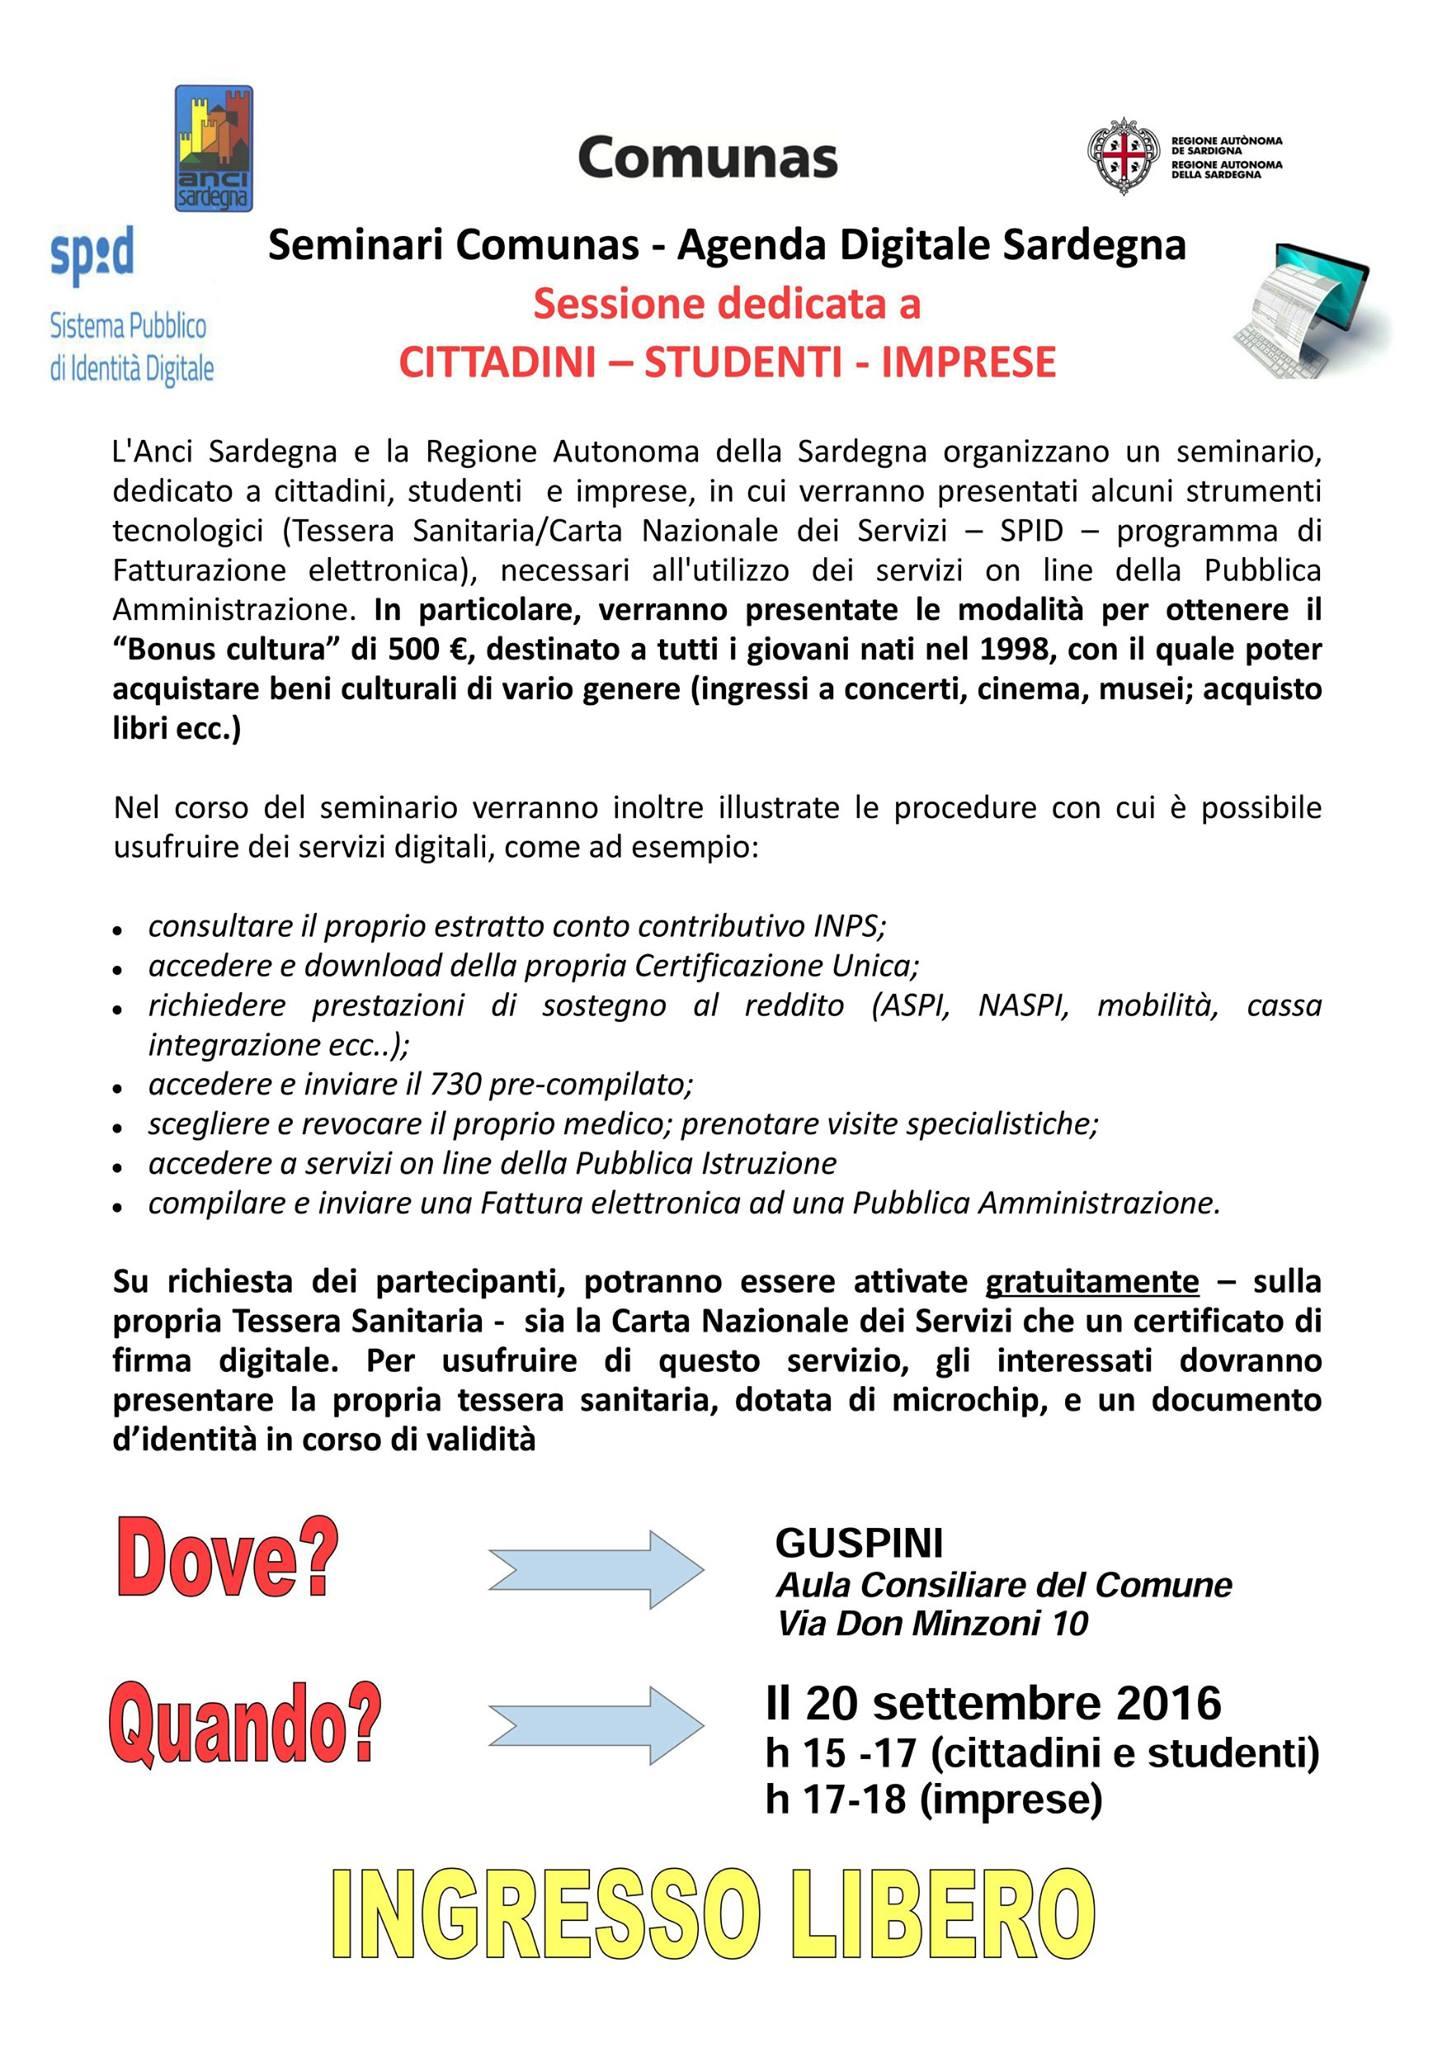 Seminari Comunas - Agenda Digitale Sardegna